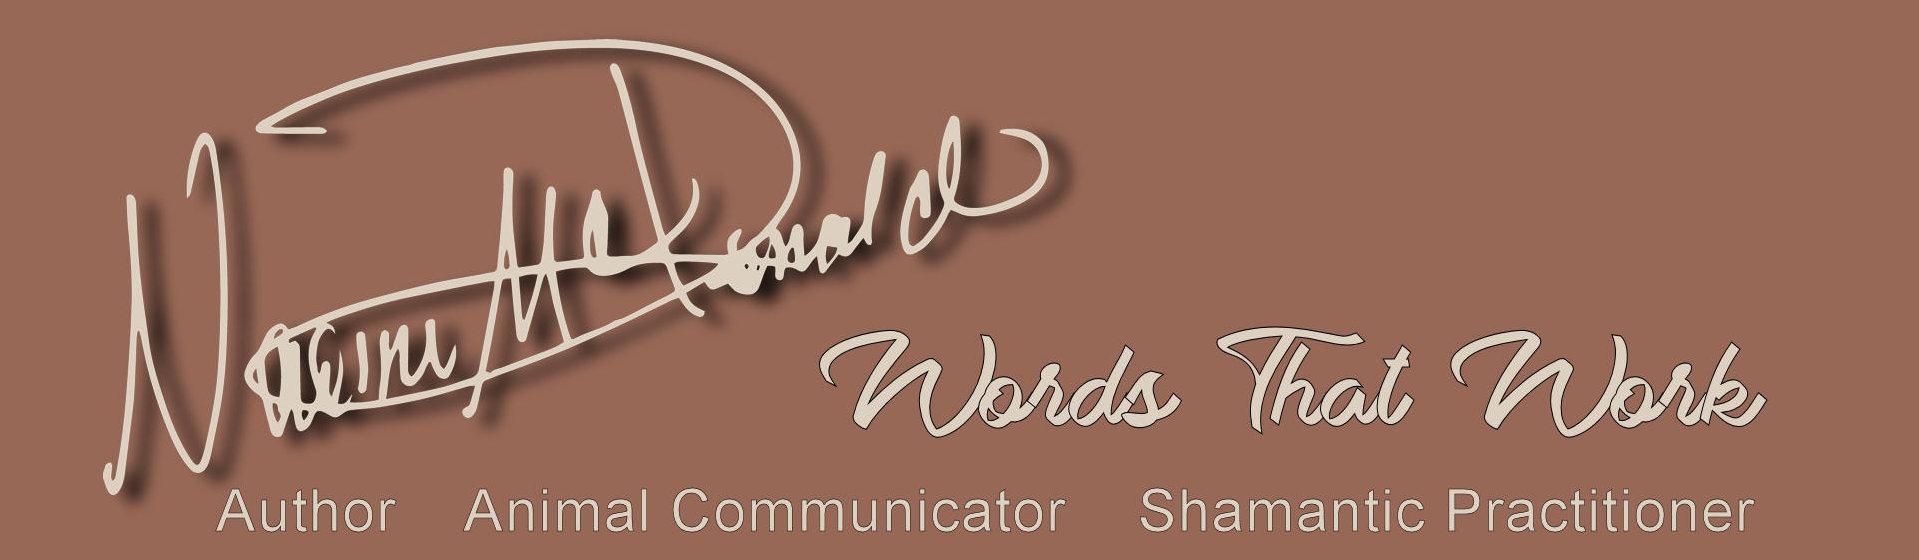 naomi mcdonald animal communicator shamantic practitioner